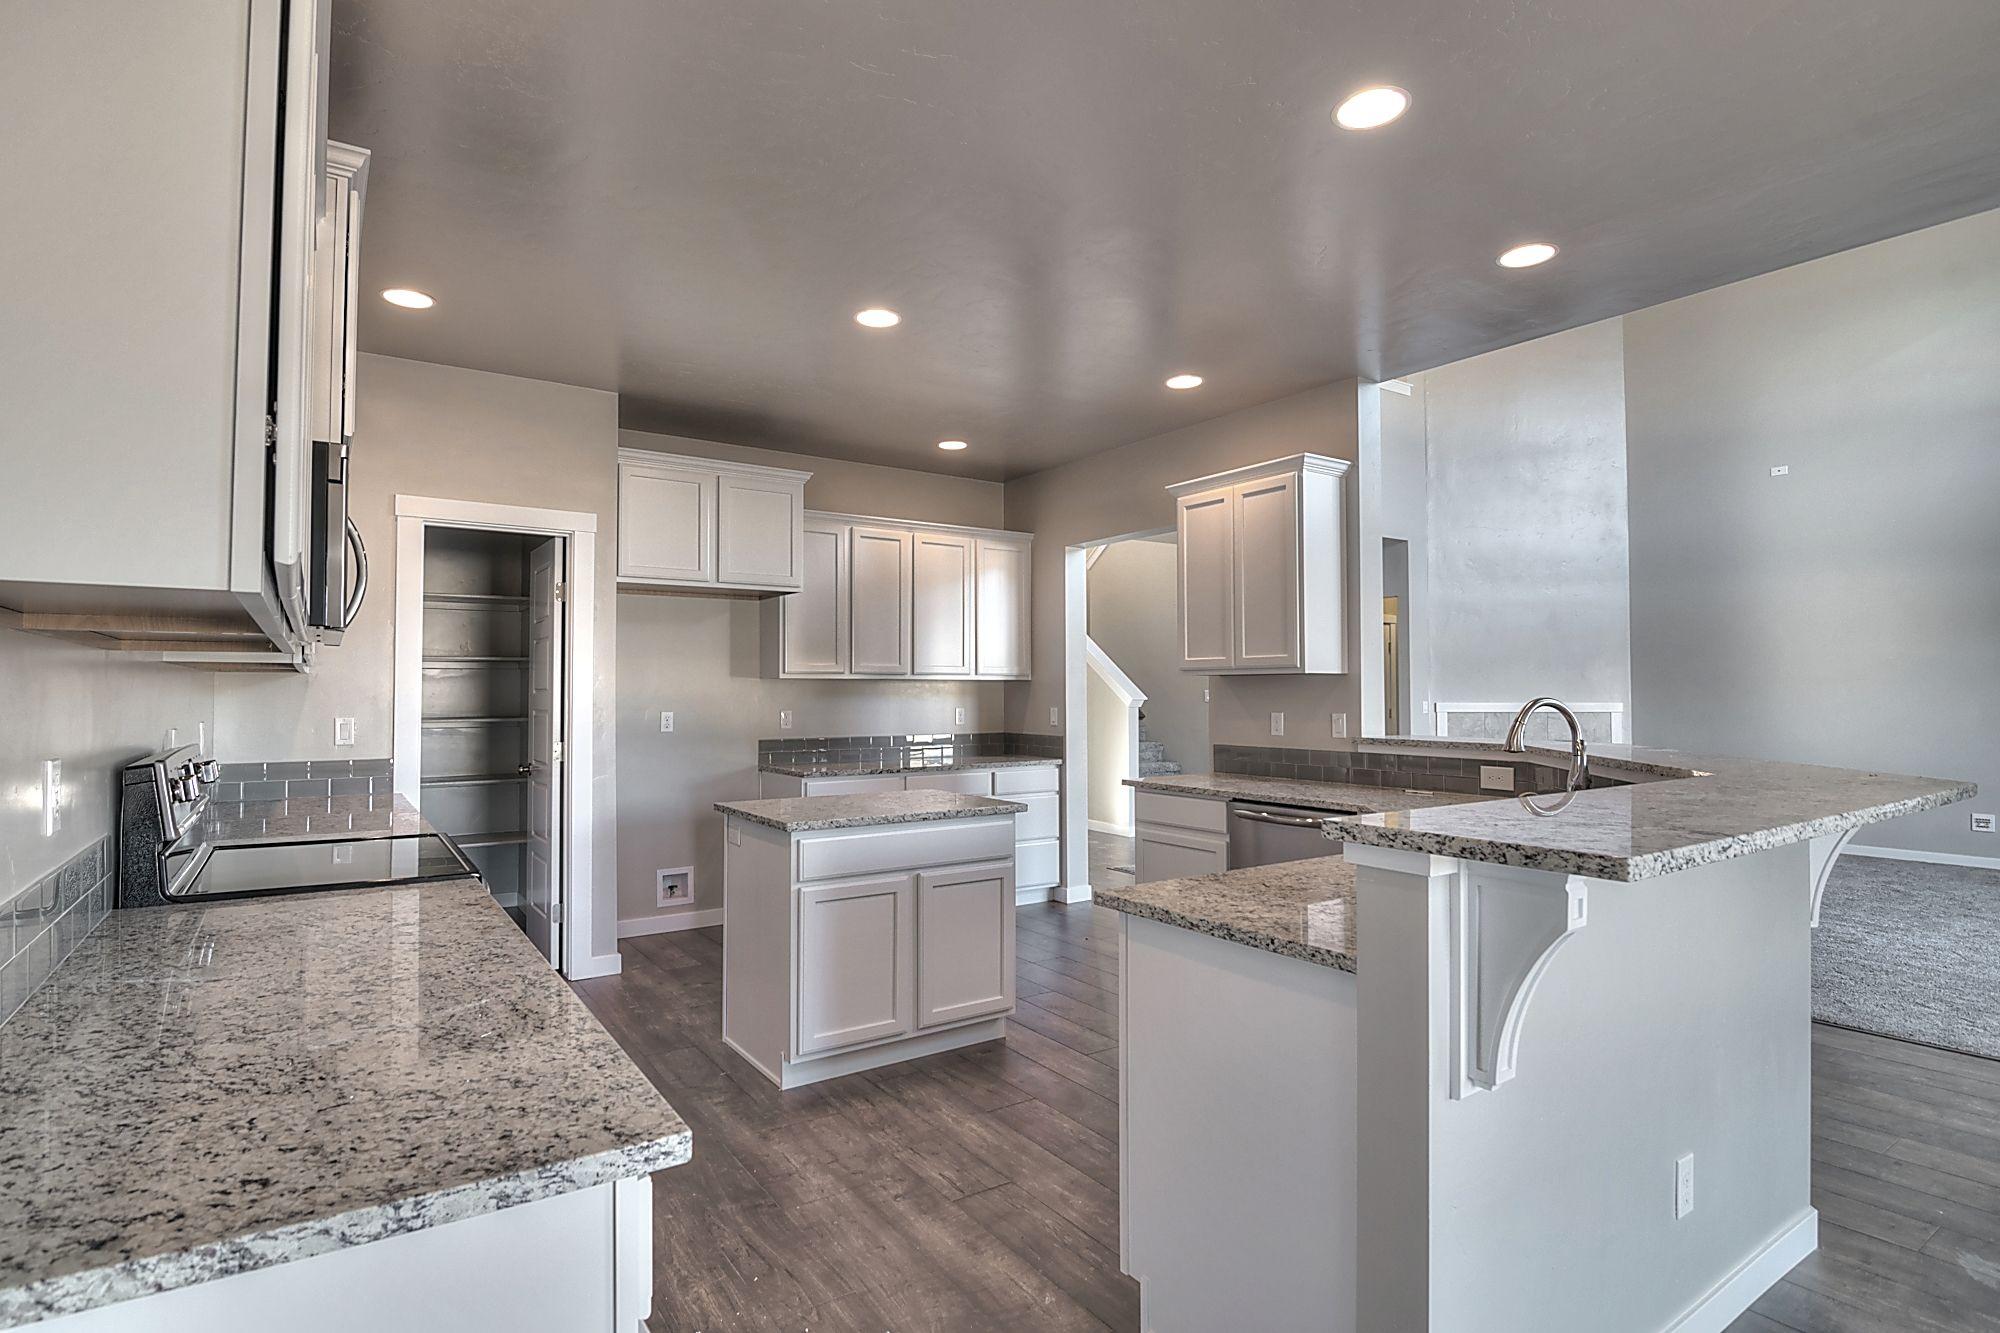 Etonnant Huge Kitchen With Merillat   Spring Valley, Maple, Cotton Cabinets, Wood  Corbels Under The Raised Breakfast Bar, Woodland Maple Wood Laminate  Flooring, ...